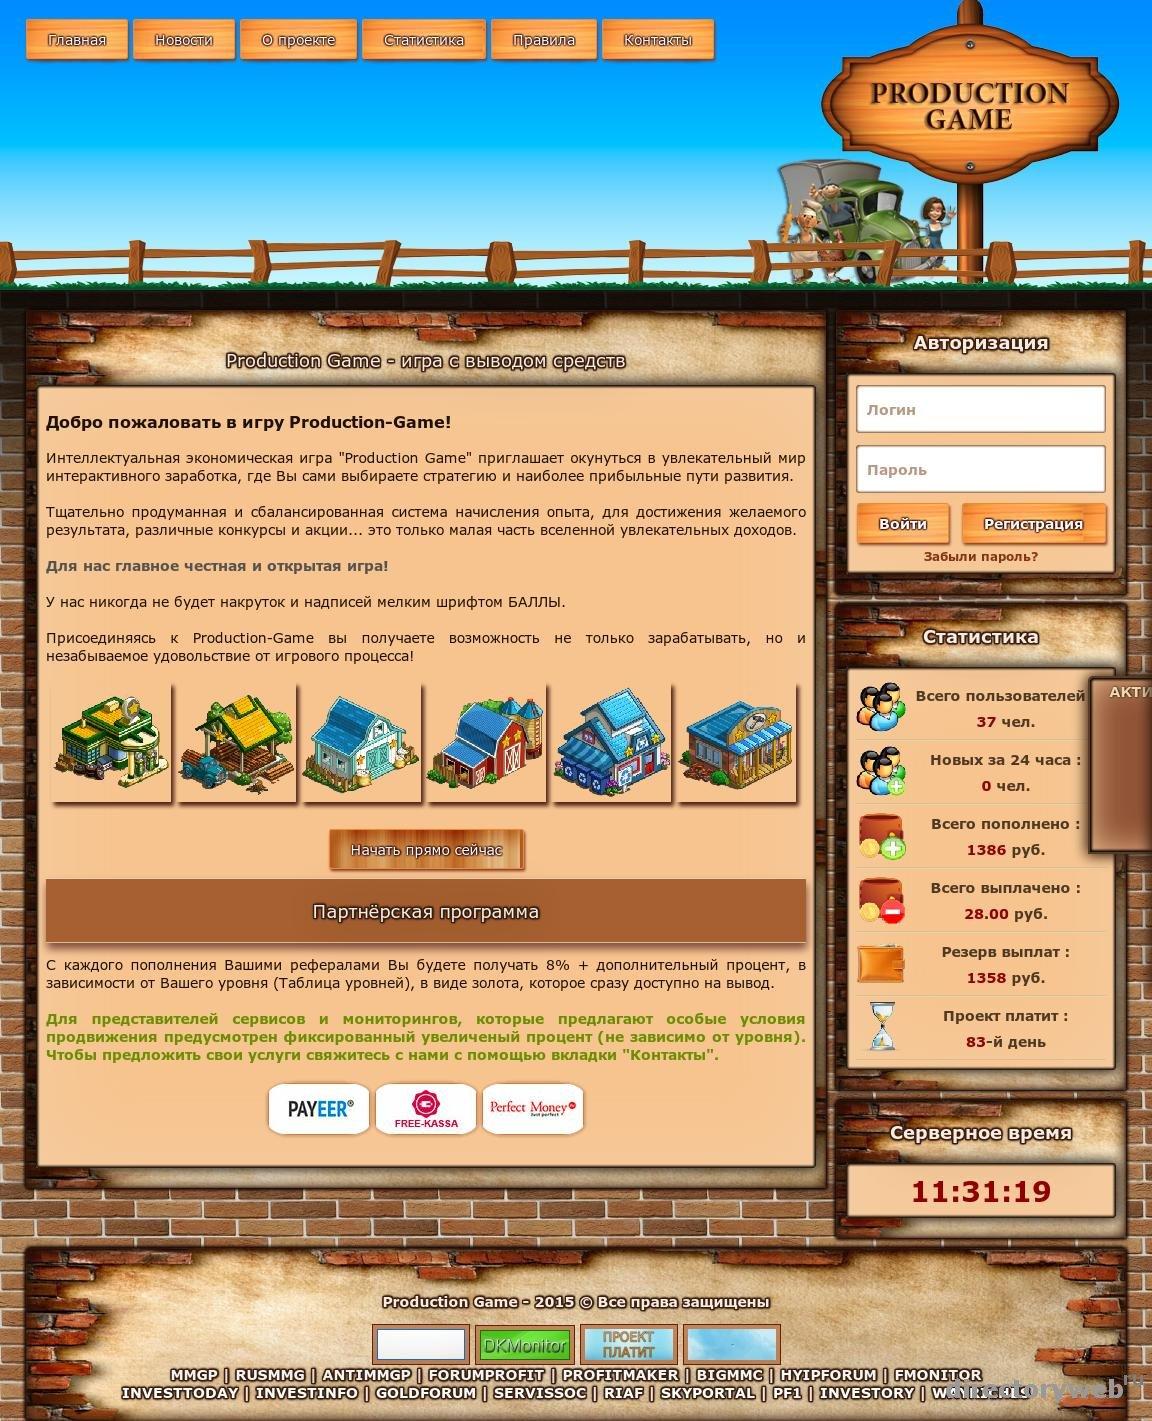 http://directoryweb.ru/uploads/posts/2015-11/1448523523_skript-investicionnoy-ekonomicheskoy-igry-production-game.jpg